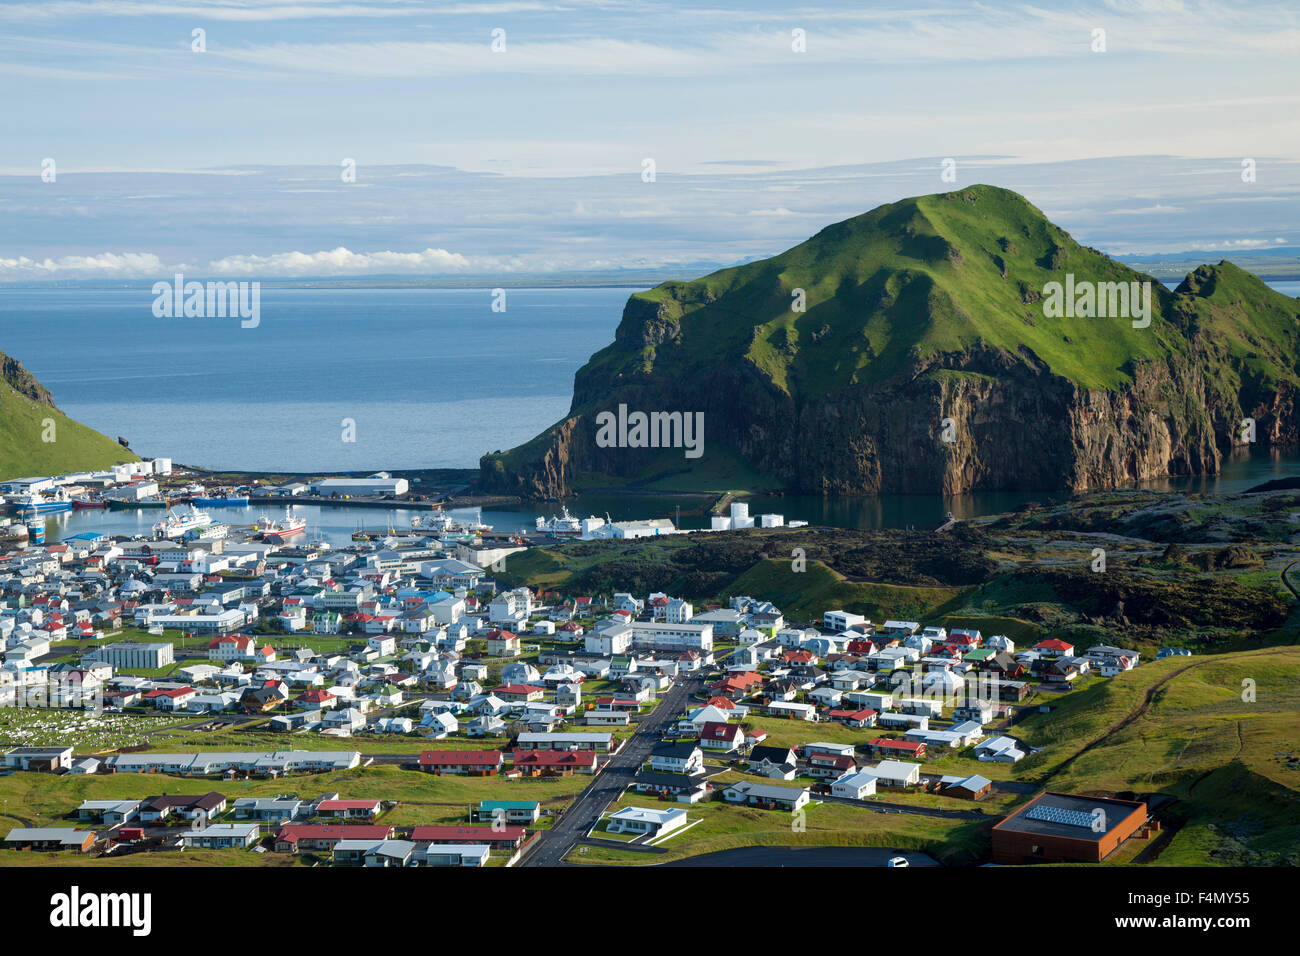 View across Heimaey town, Heimaey, Westman Islands, Sudhurland, Iceland. - Stock Image